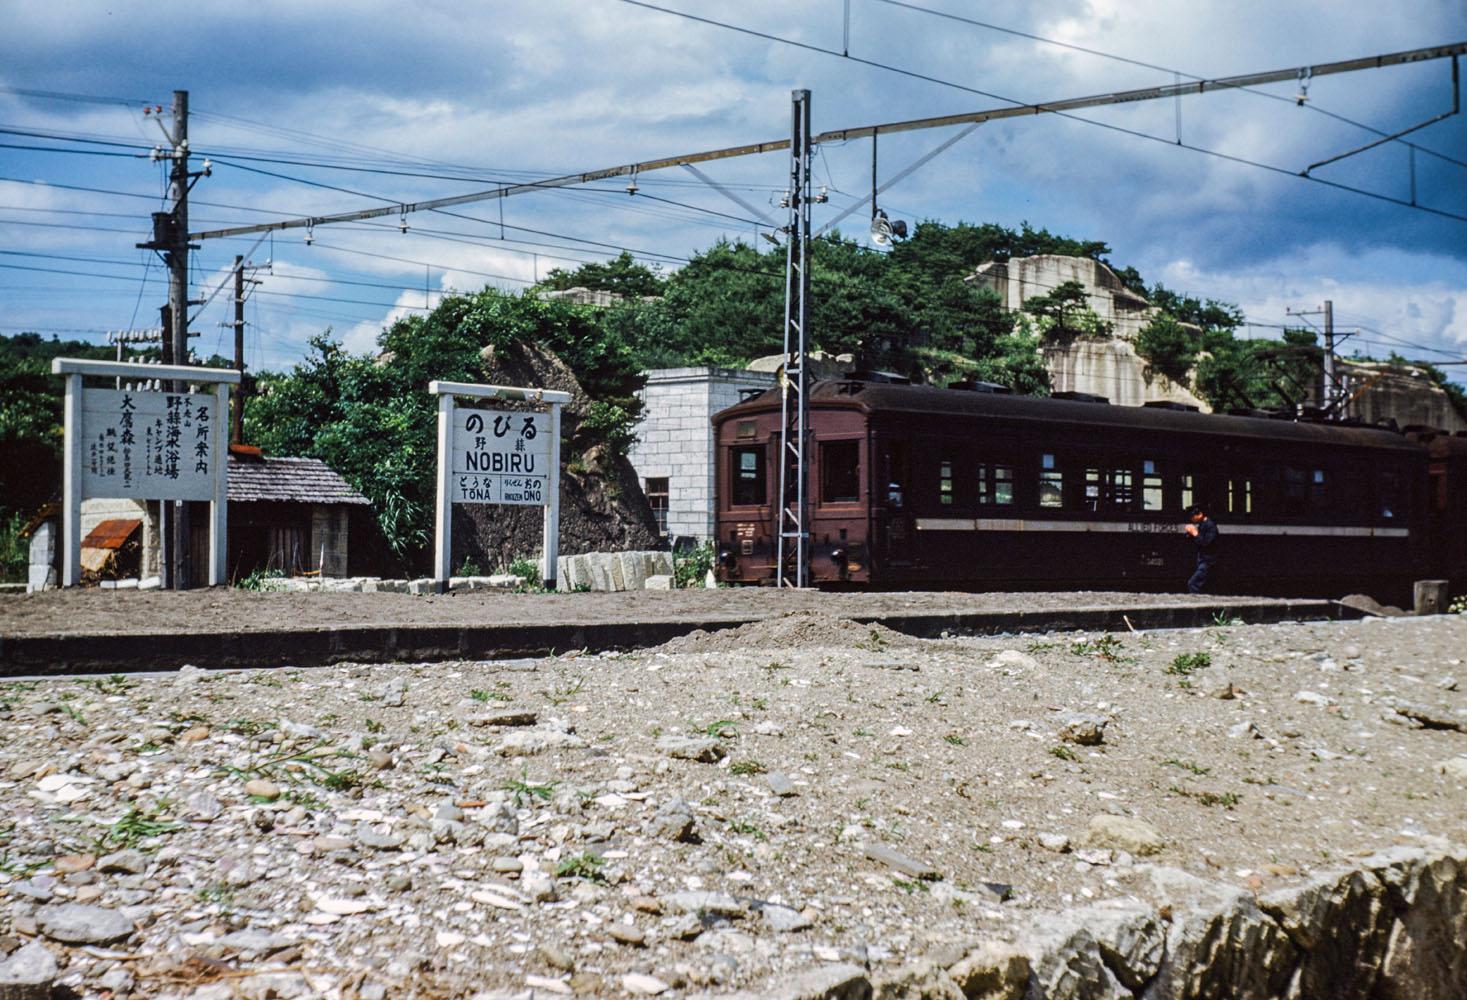 505- Nobiru Railway Station